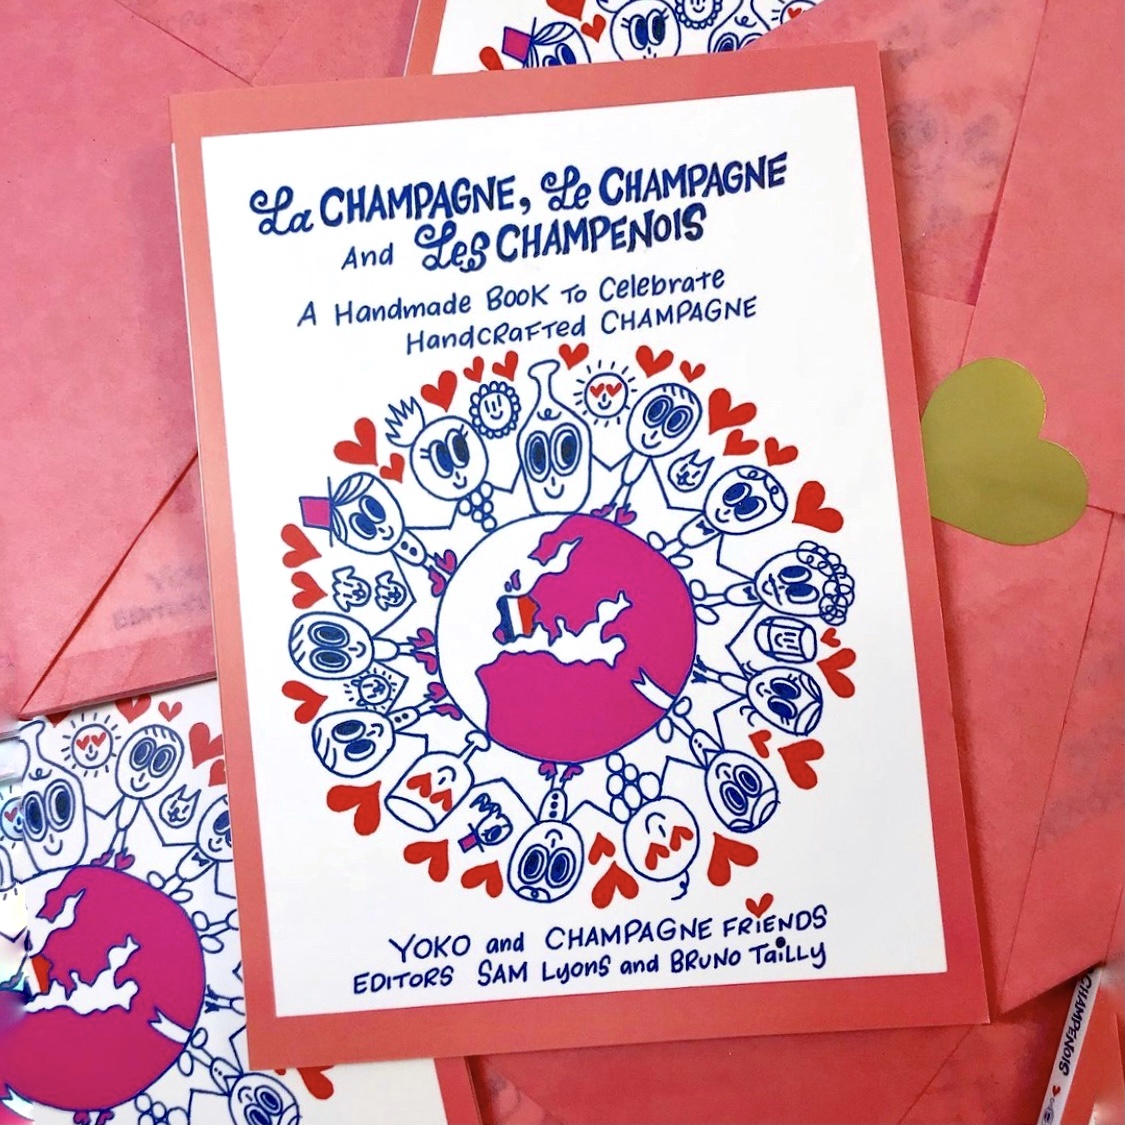 La_Champagne_Le_Champagne_Les_Champenois_book_wrap